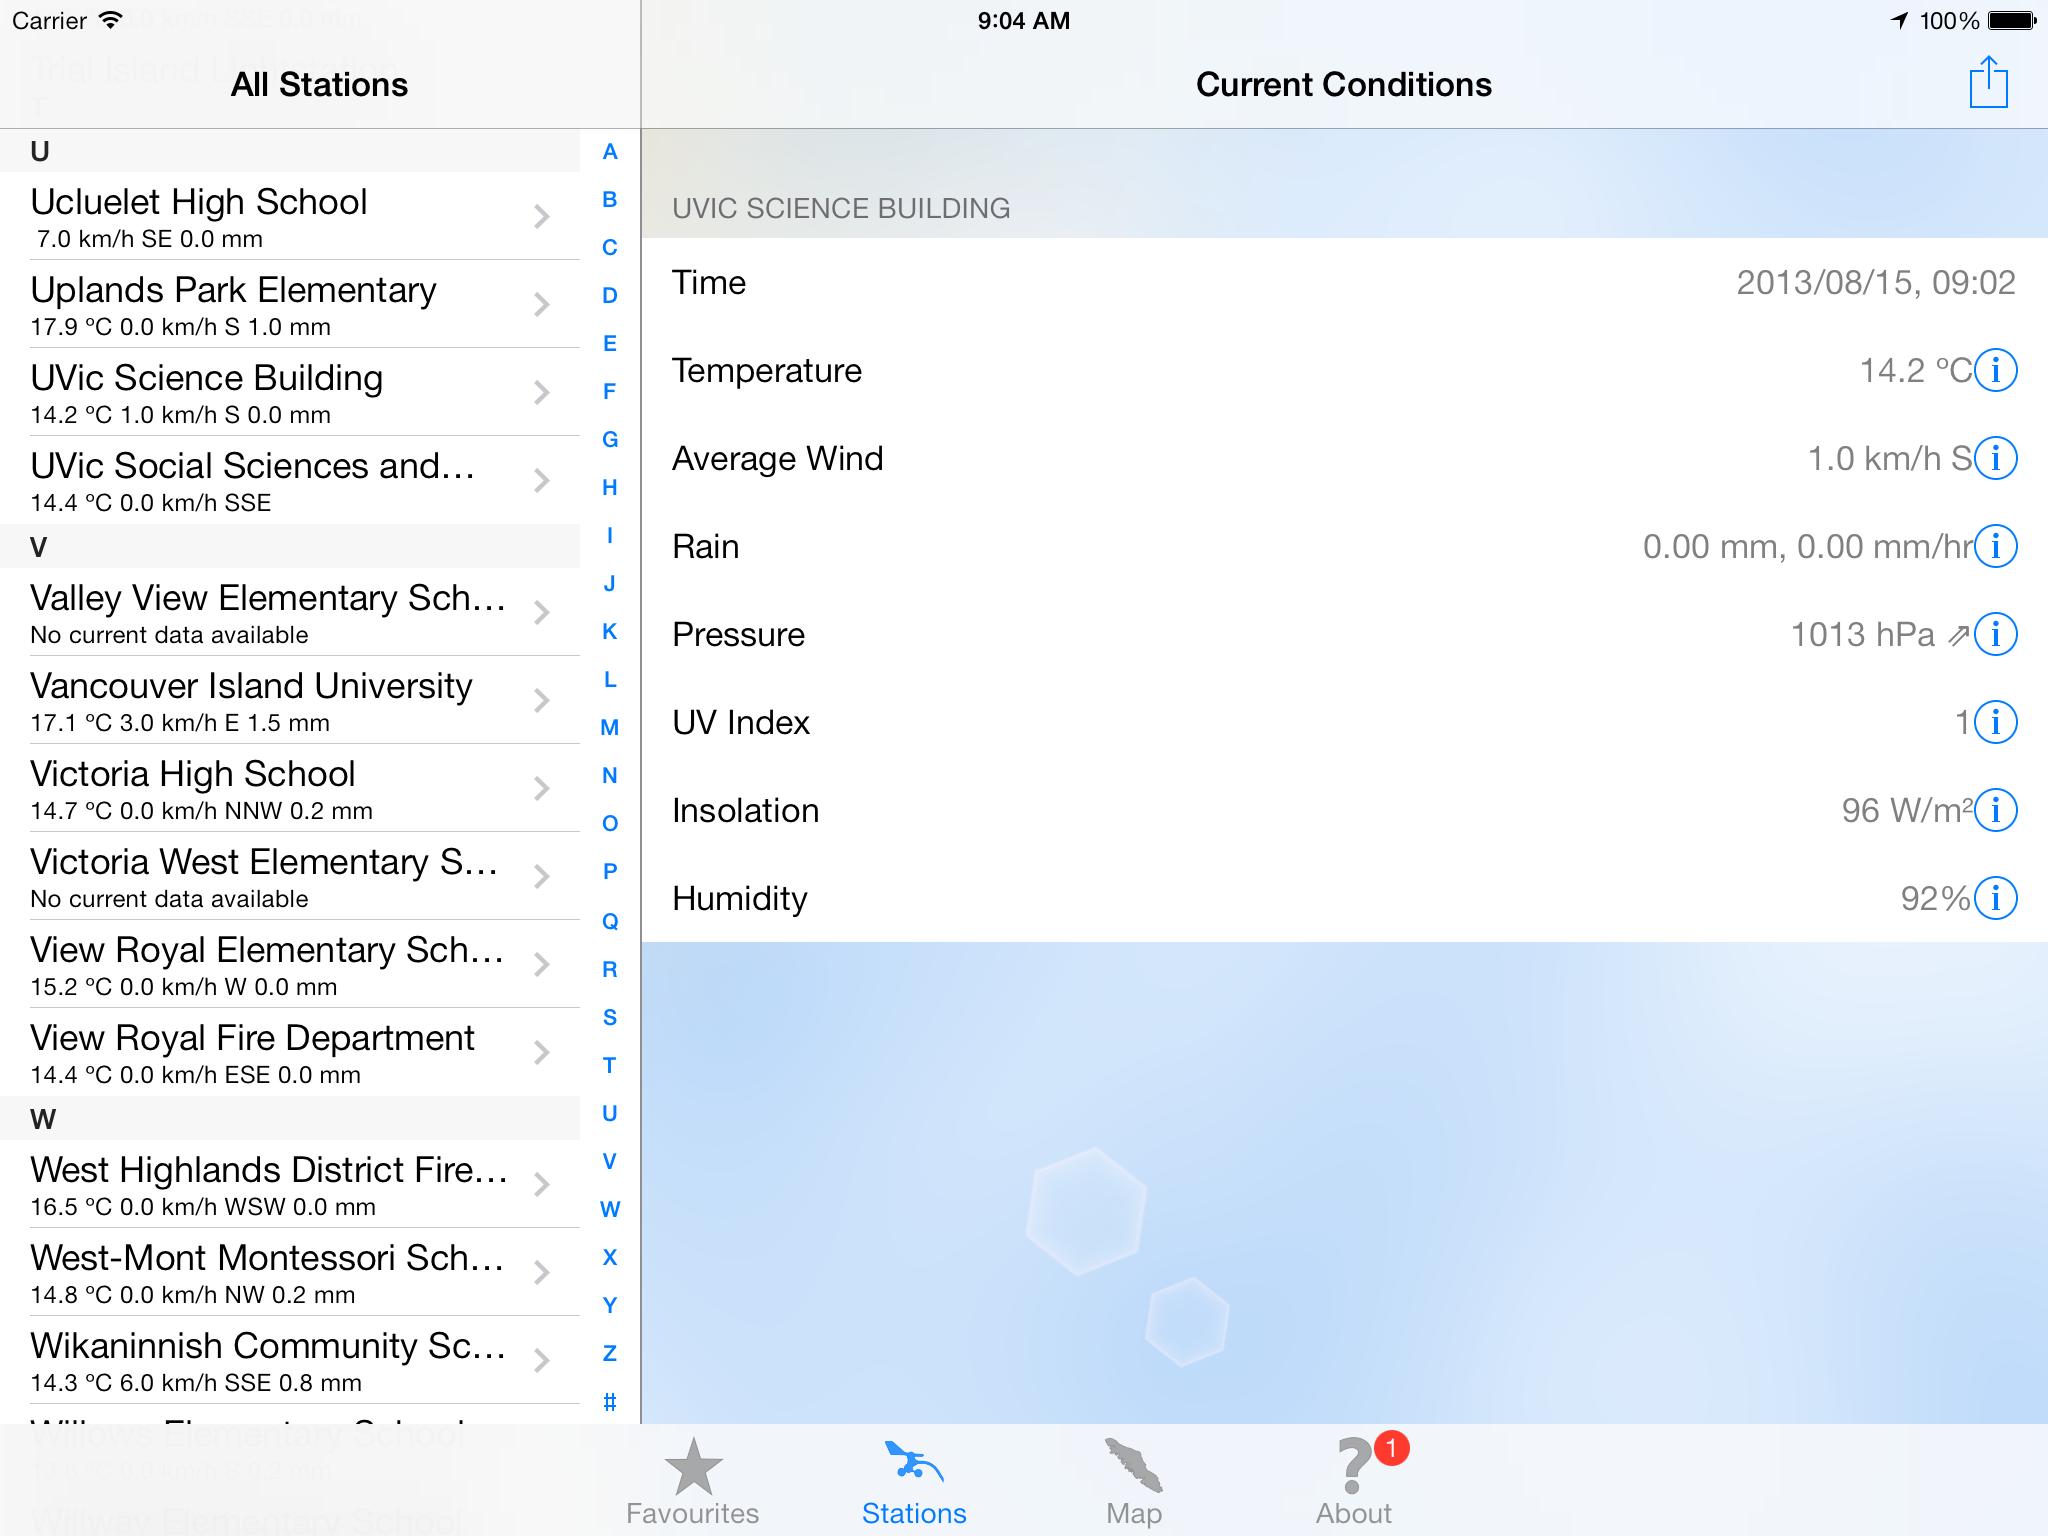 iOS Simulator Screen shot 2013-08-15 9.04.35 AM.png